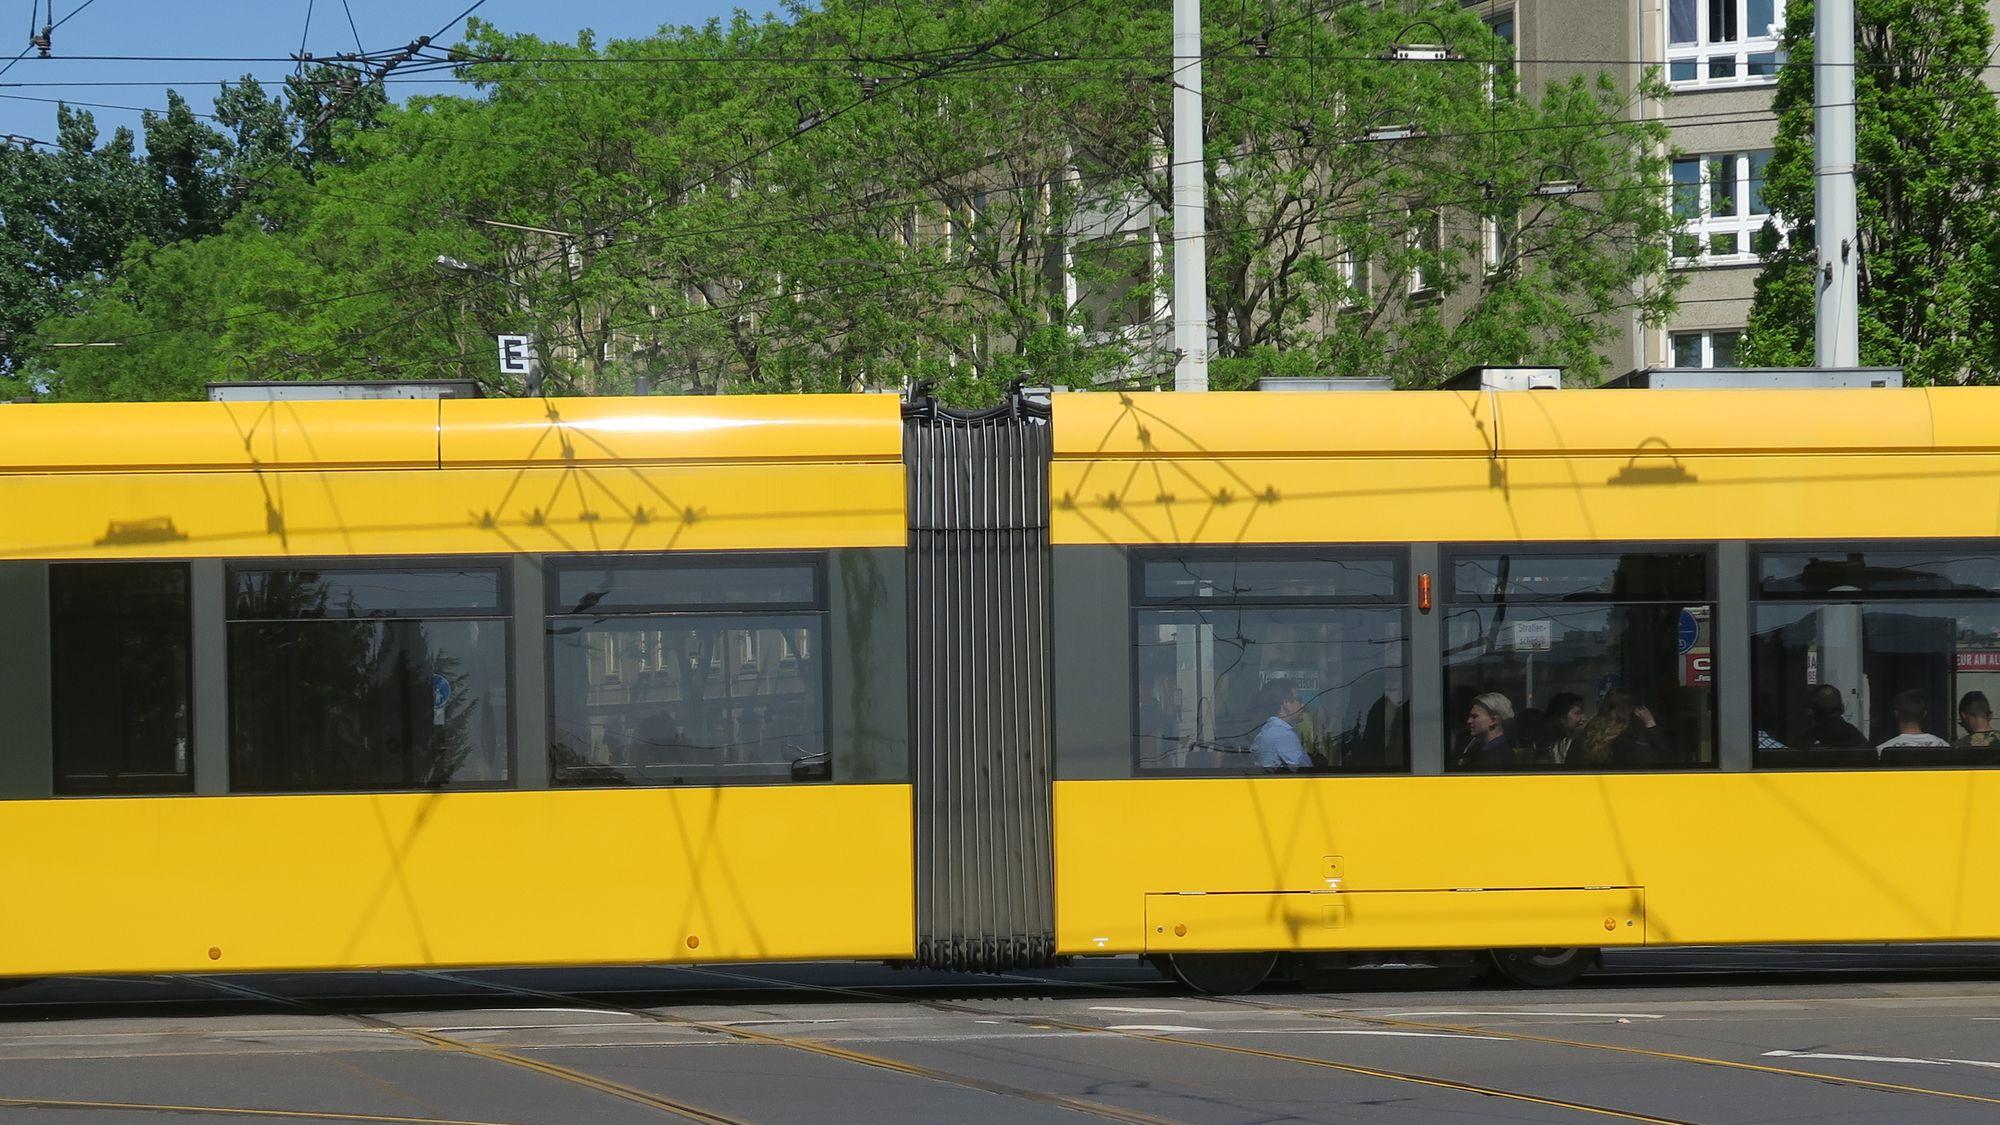 Straßenbahn am Albertplatz